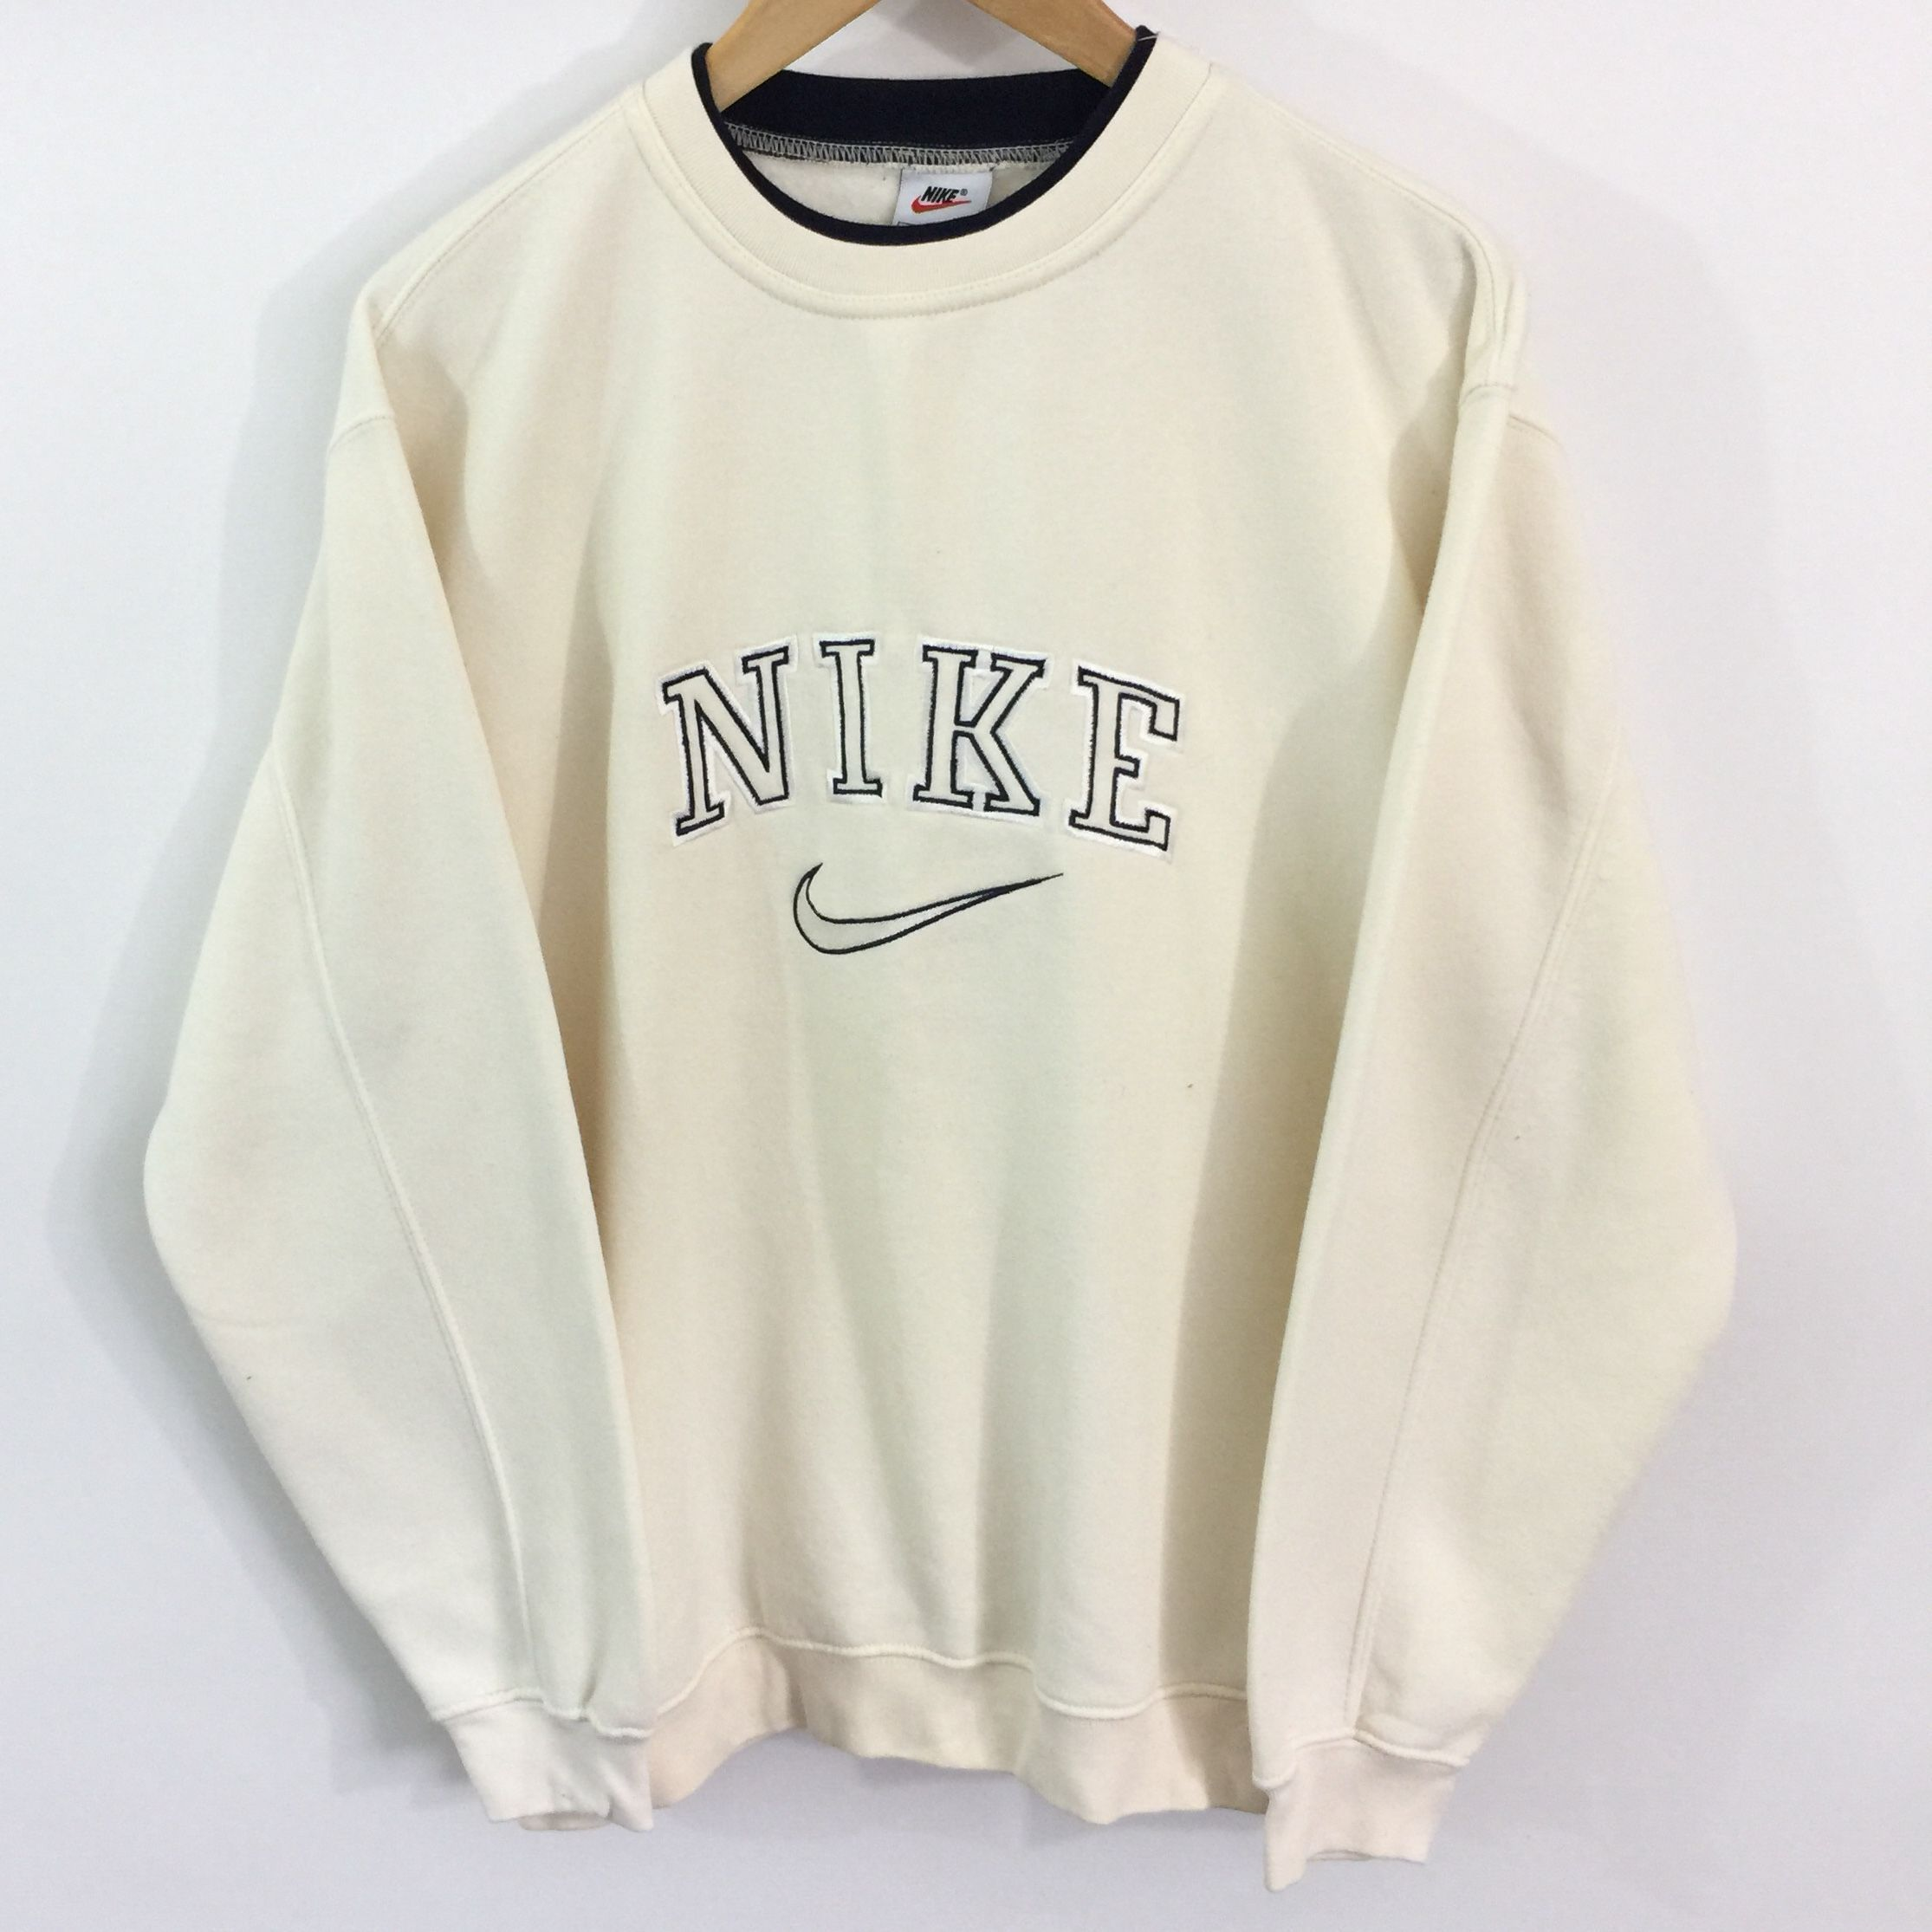 Vintage Nike Sweatshirt Label Size Medium Cream Depop Vintage Nike Sweatshirt Label Si Vintage Nike Sweatshirt Sweatshirt Outfit Vintage Hoodies [ 2230 x 2230 Pixel ]